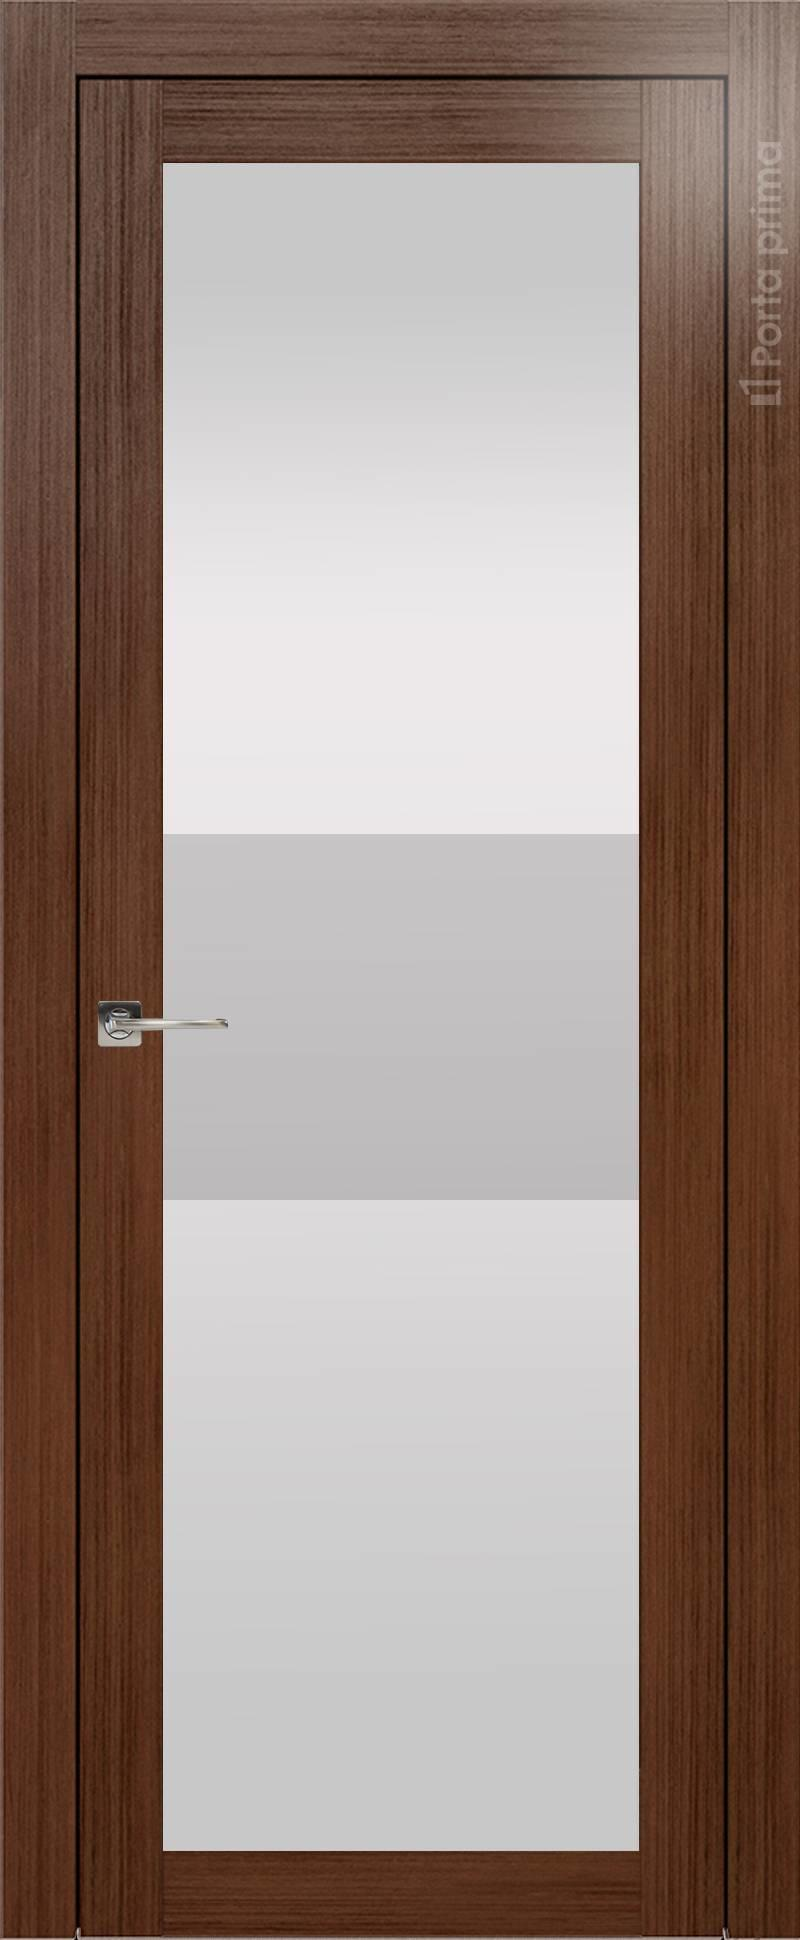 Tivoli З-4 цвет - Темный орех Со стеклом (ДО)